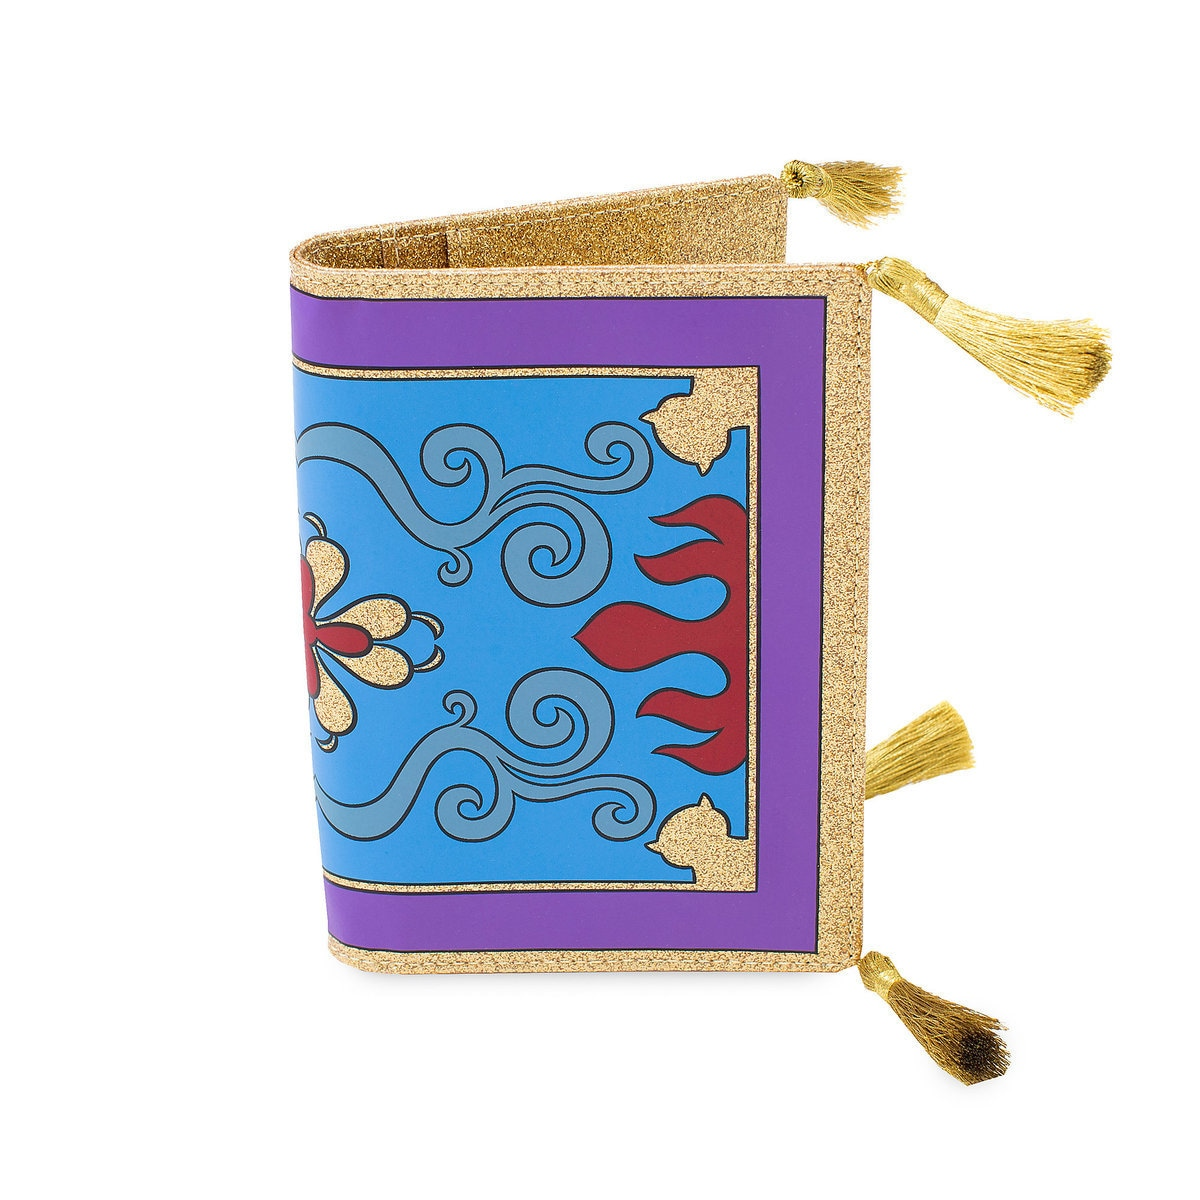 106249eca Product Image of Magic Carpet Passport Holder by Cakeworthy - Aladdin # 1